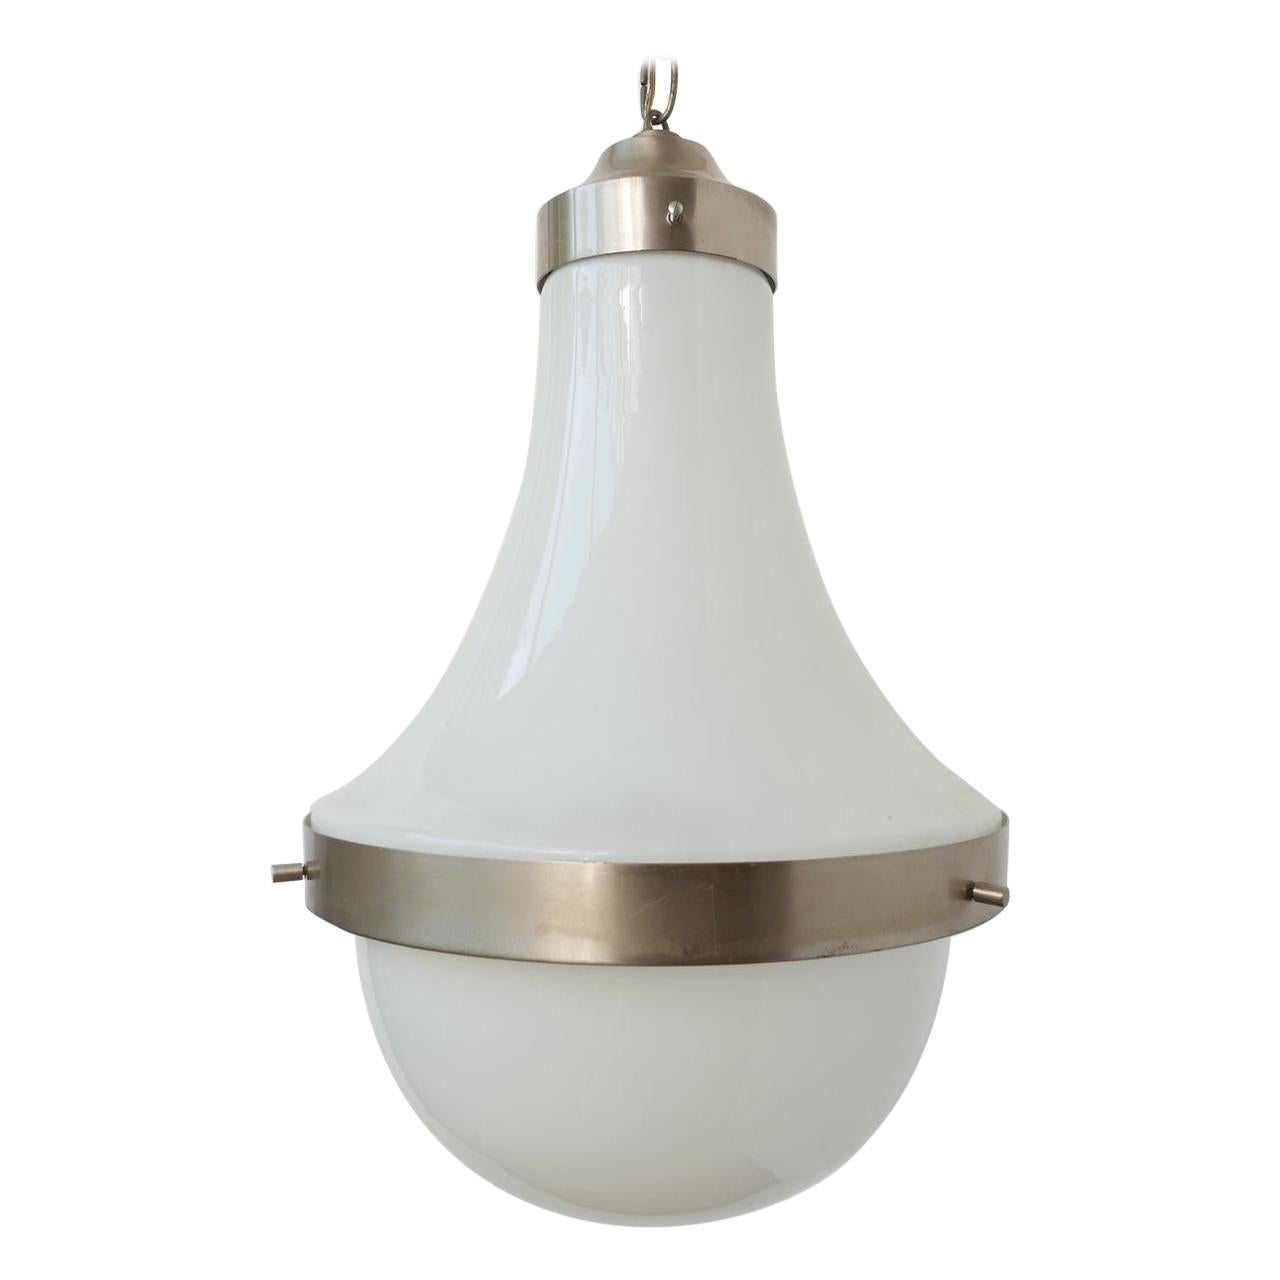 Midcentury Italian Pendant Lamp by Sergio Mazza